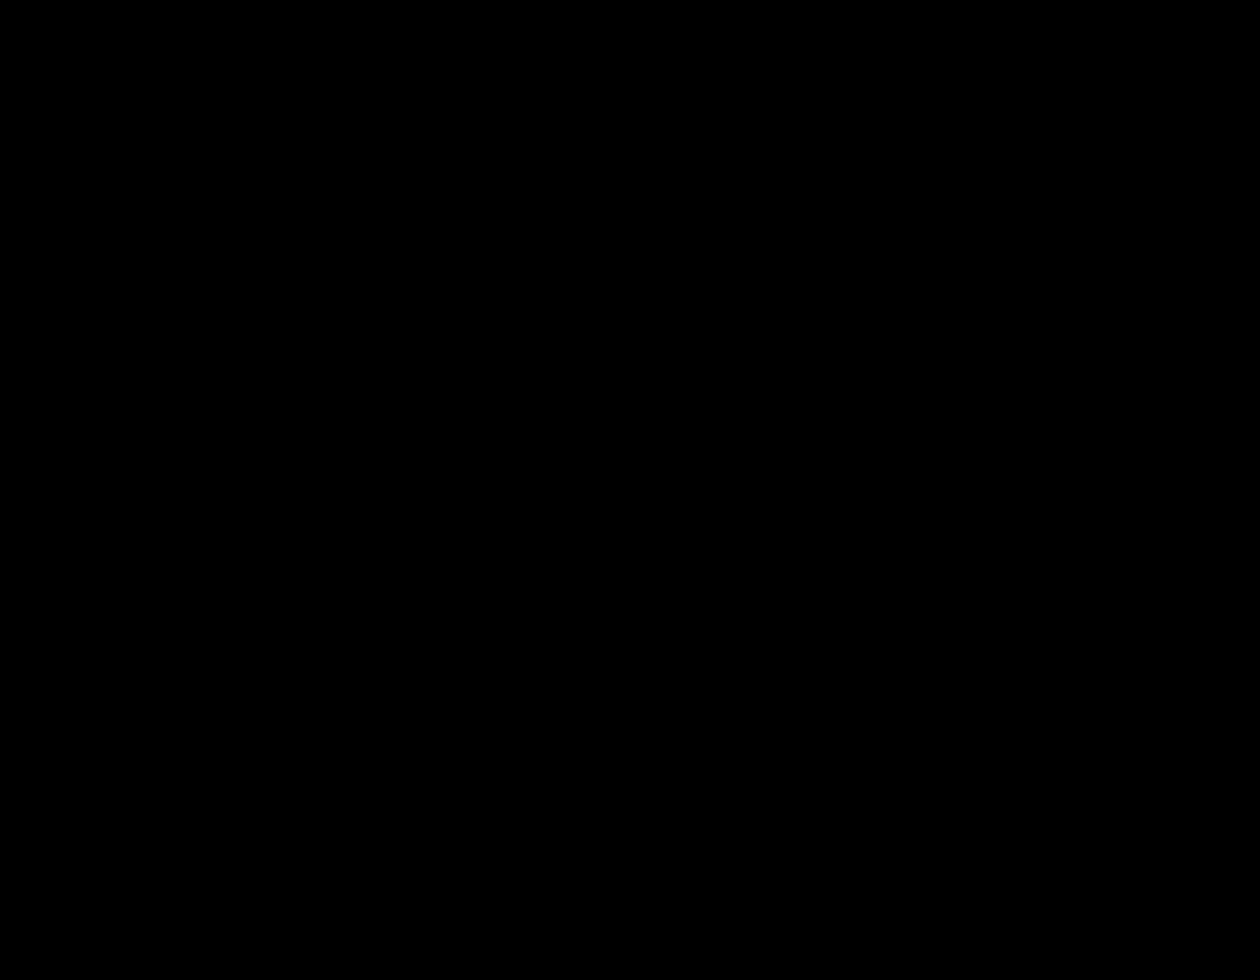 vienna-buddha-field-logo-text